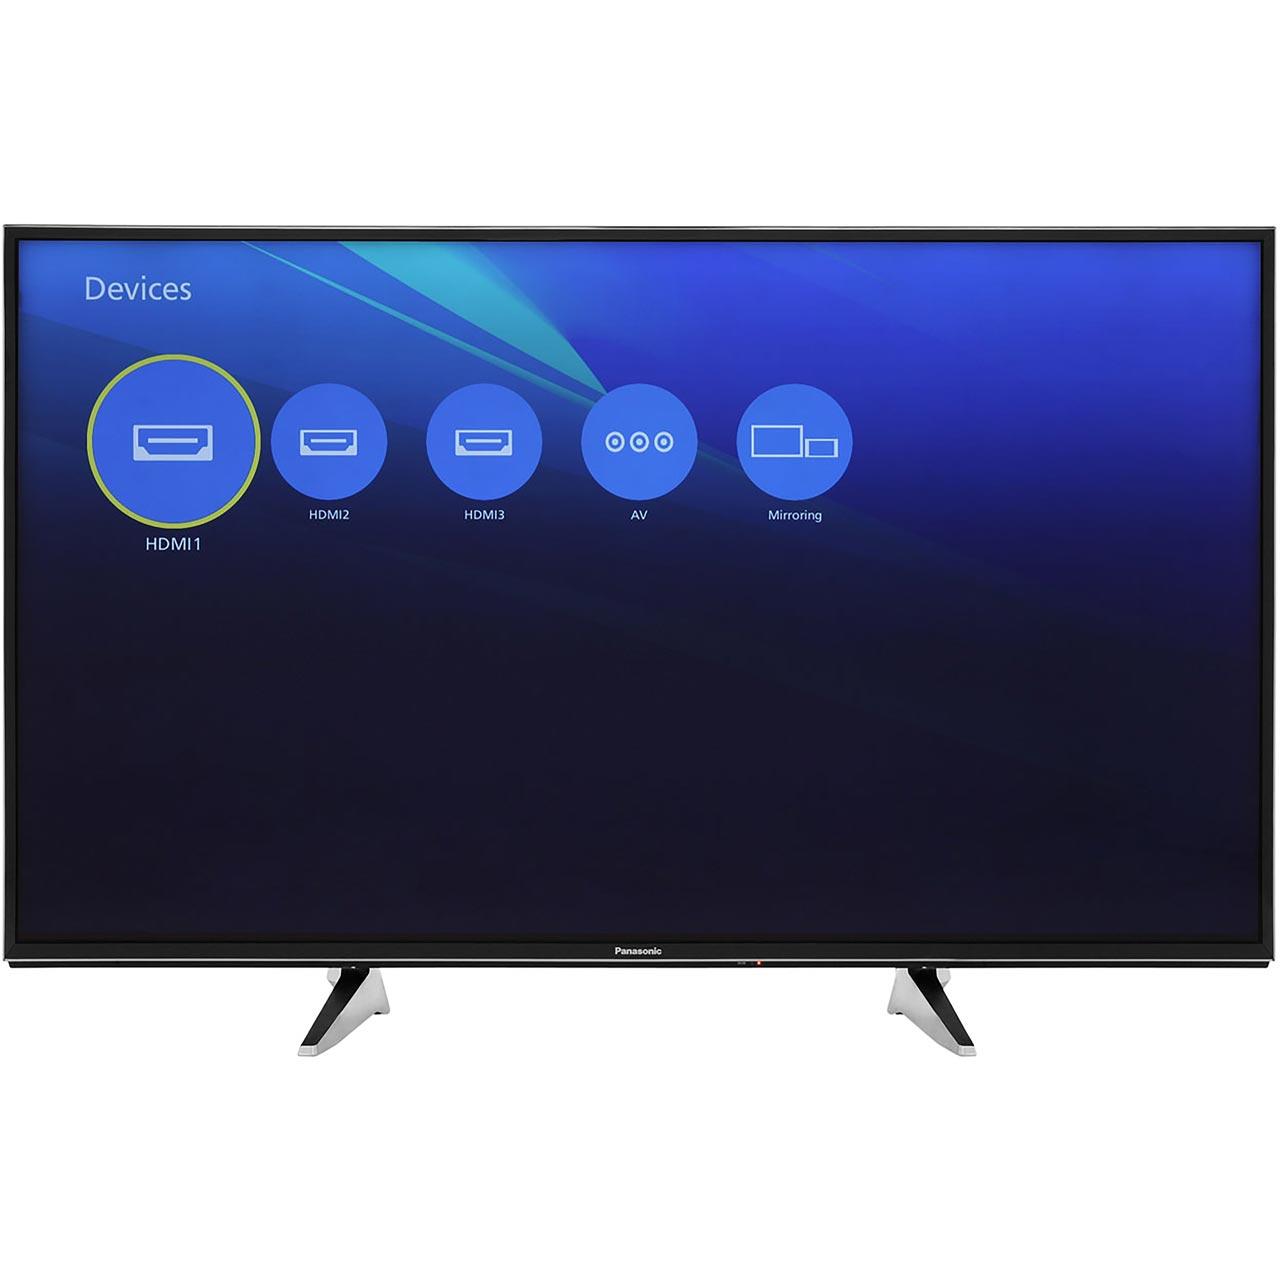 Panasonic Tx 40ex600b 40 Inch Smart Led Tv 4k Ultra Hd